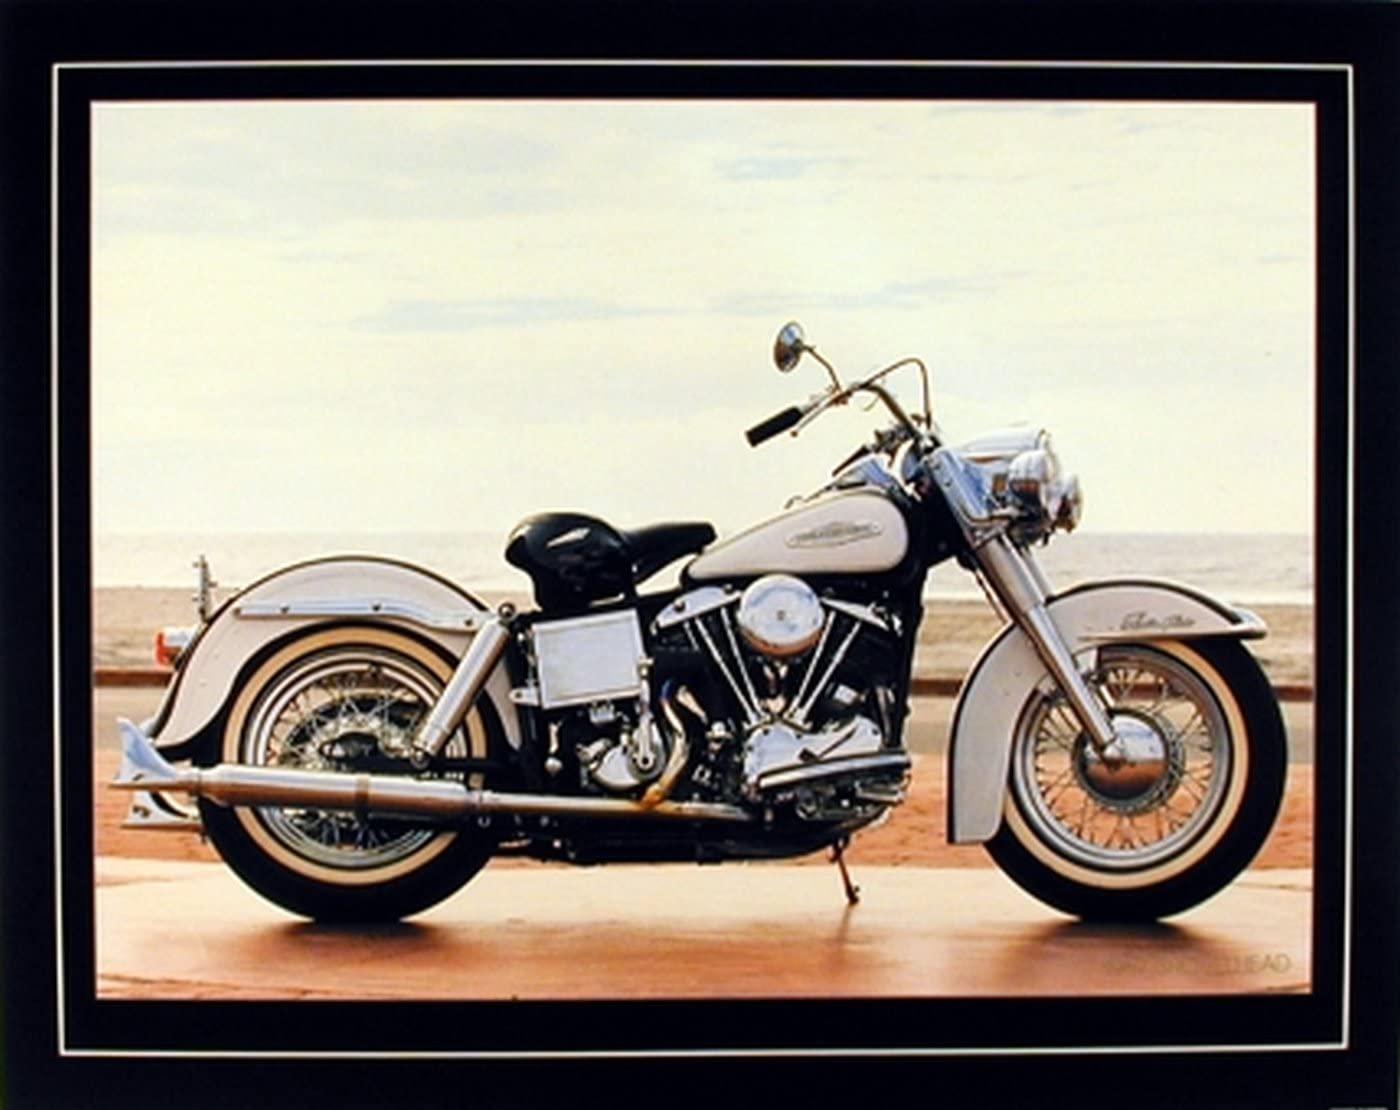 Motorcycle Wall Decor 1967 White Shovelhead Harley Davidson Vintage Bike Art Print Poster (16x20)